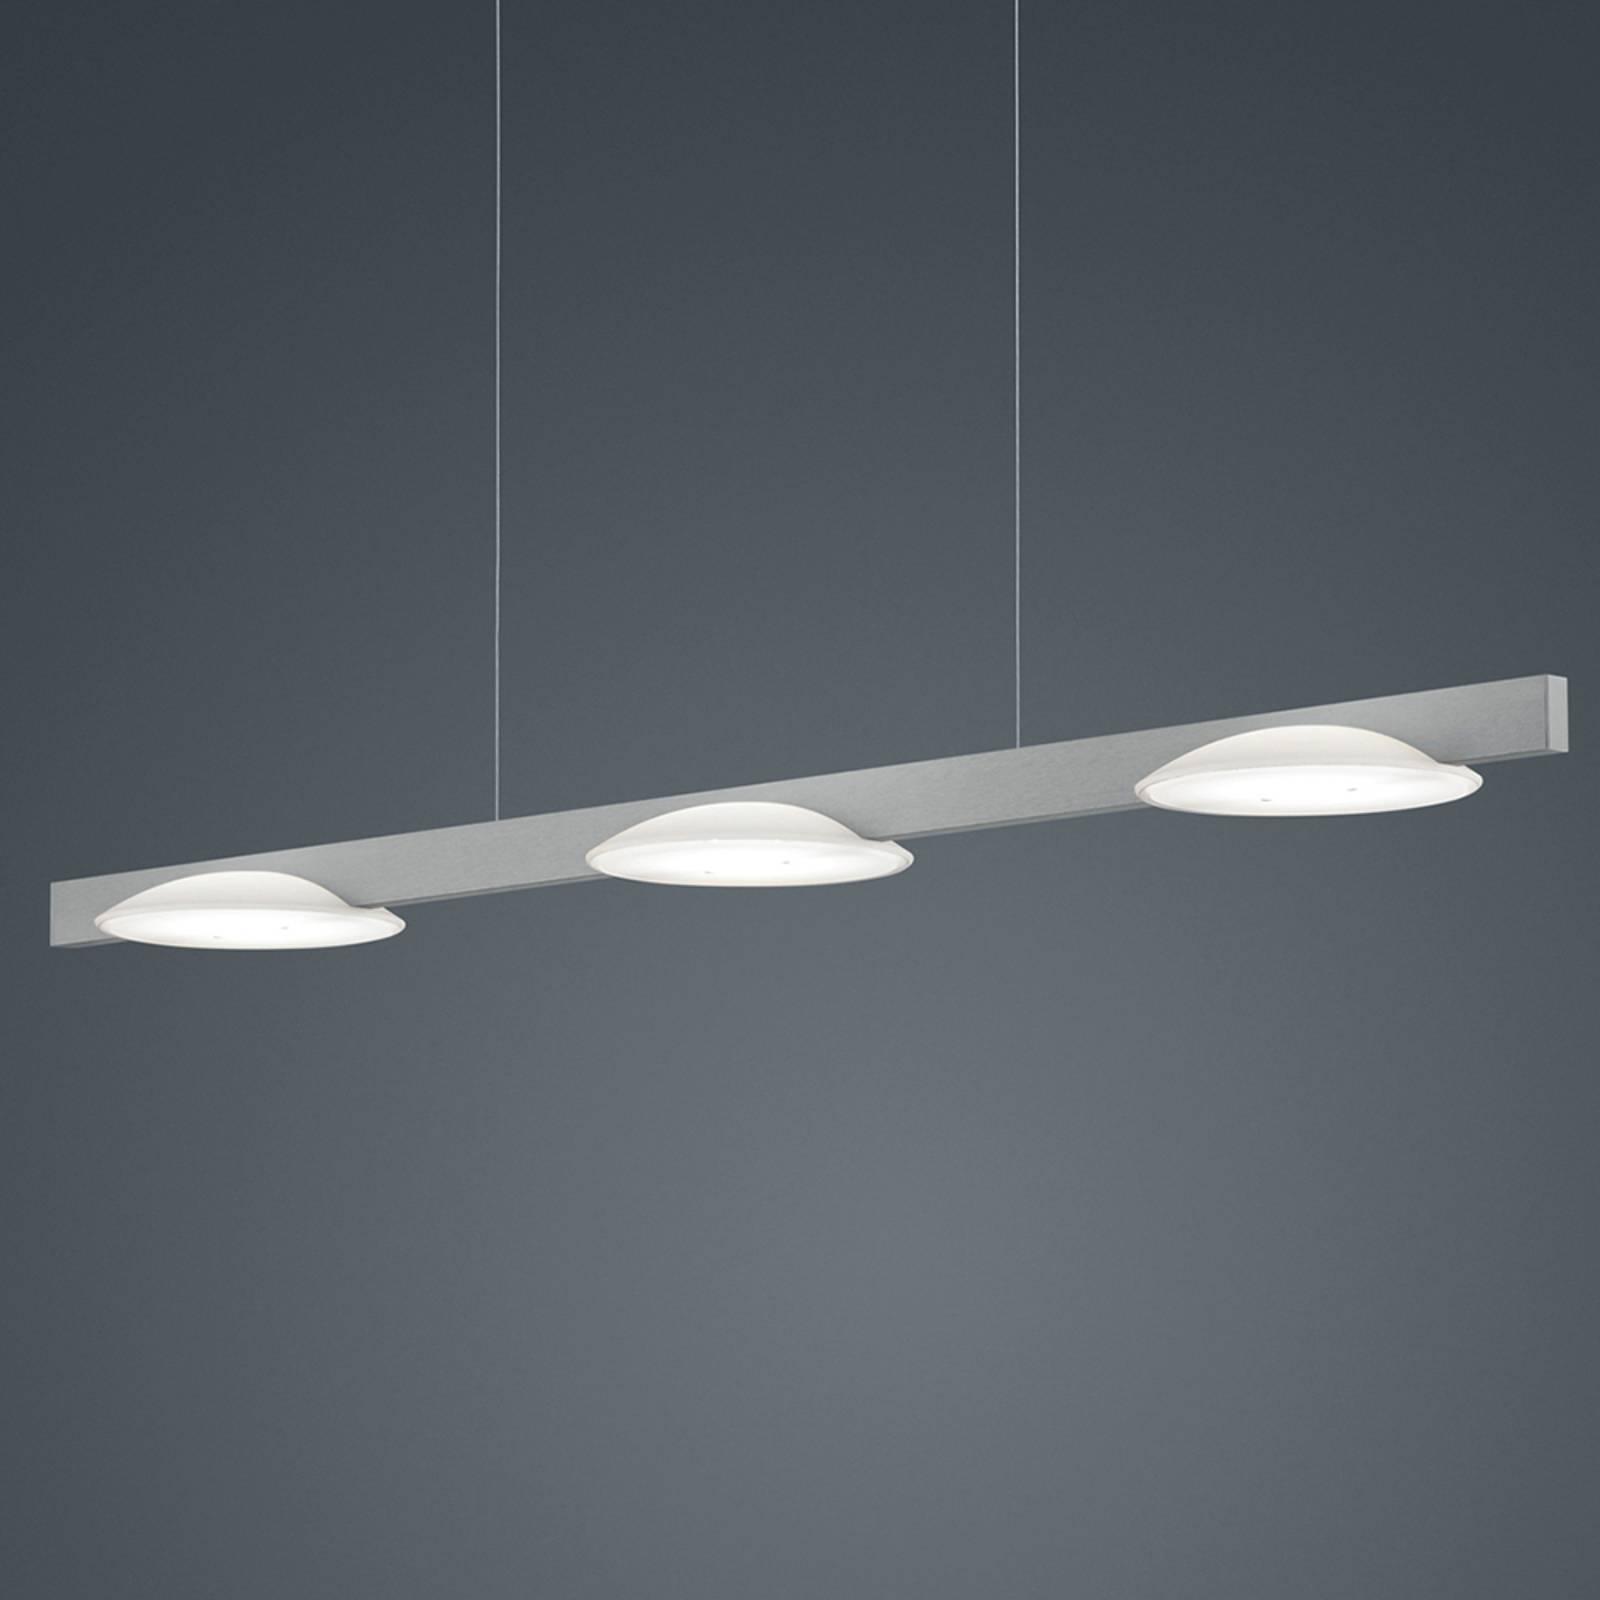 Helestra Pole -LED-riippuvalaisin 3-lamp. nikkeli